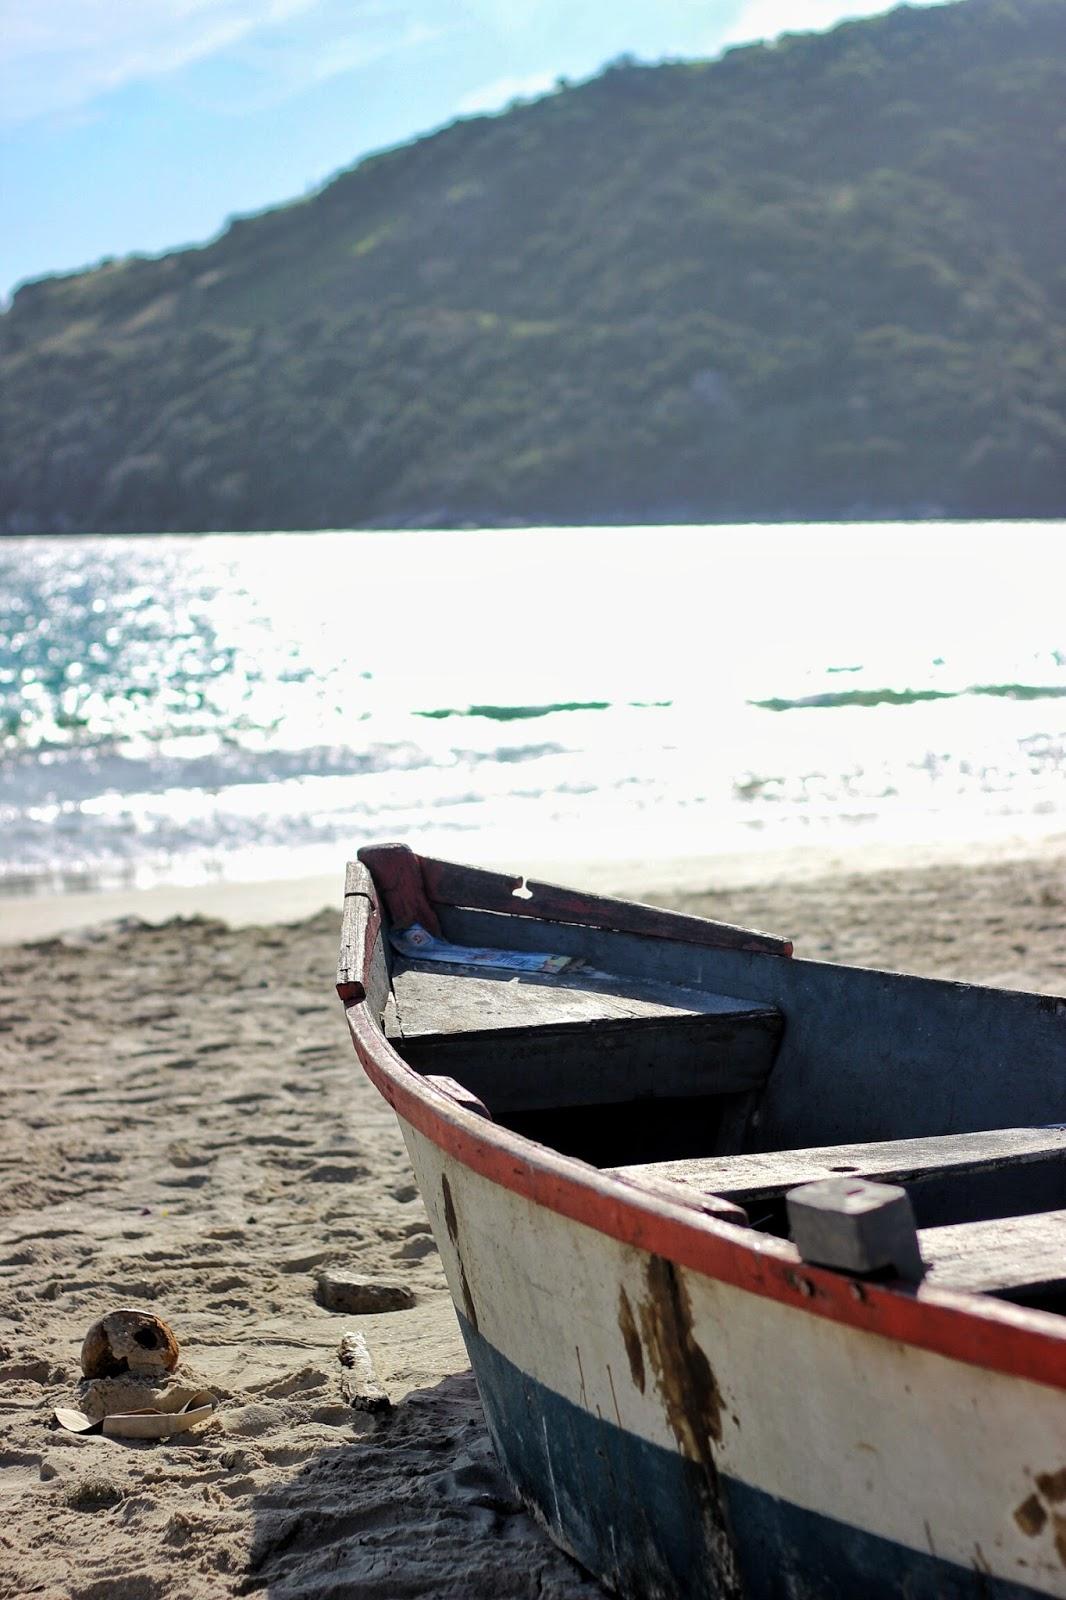 lifesthayle-arraial-do-cabo-prainha-barco.JPG